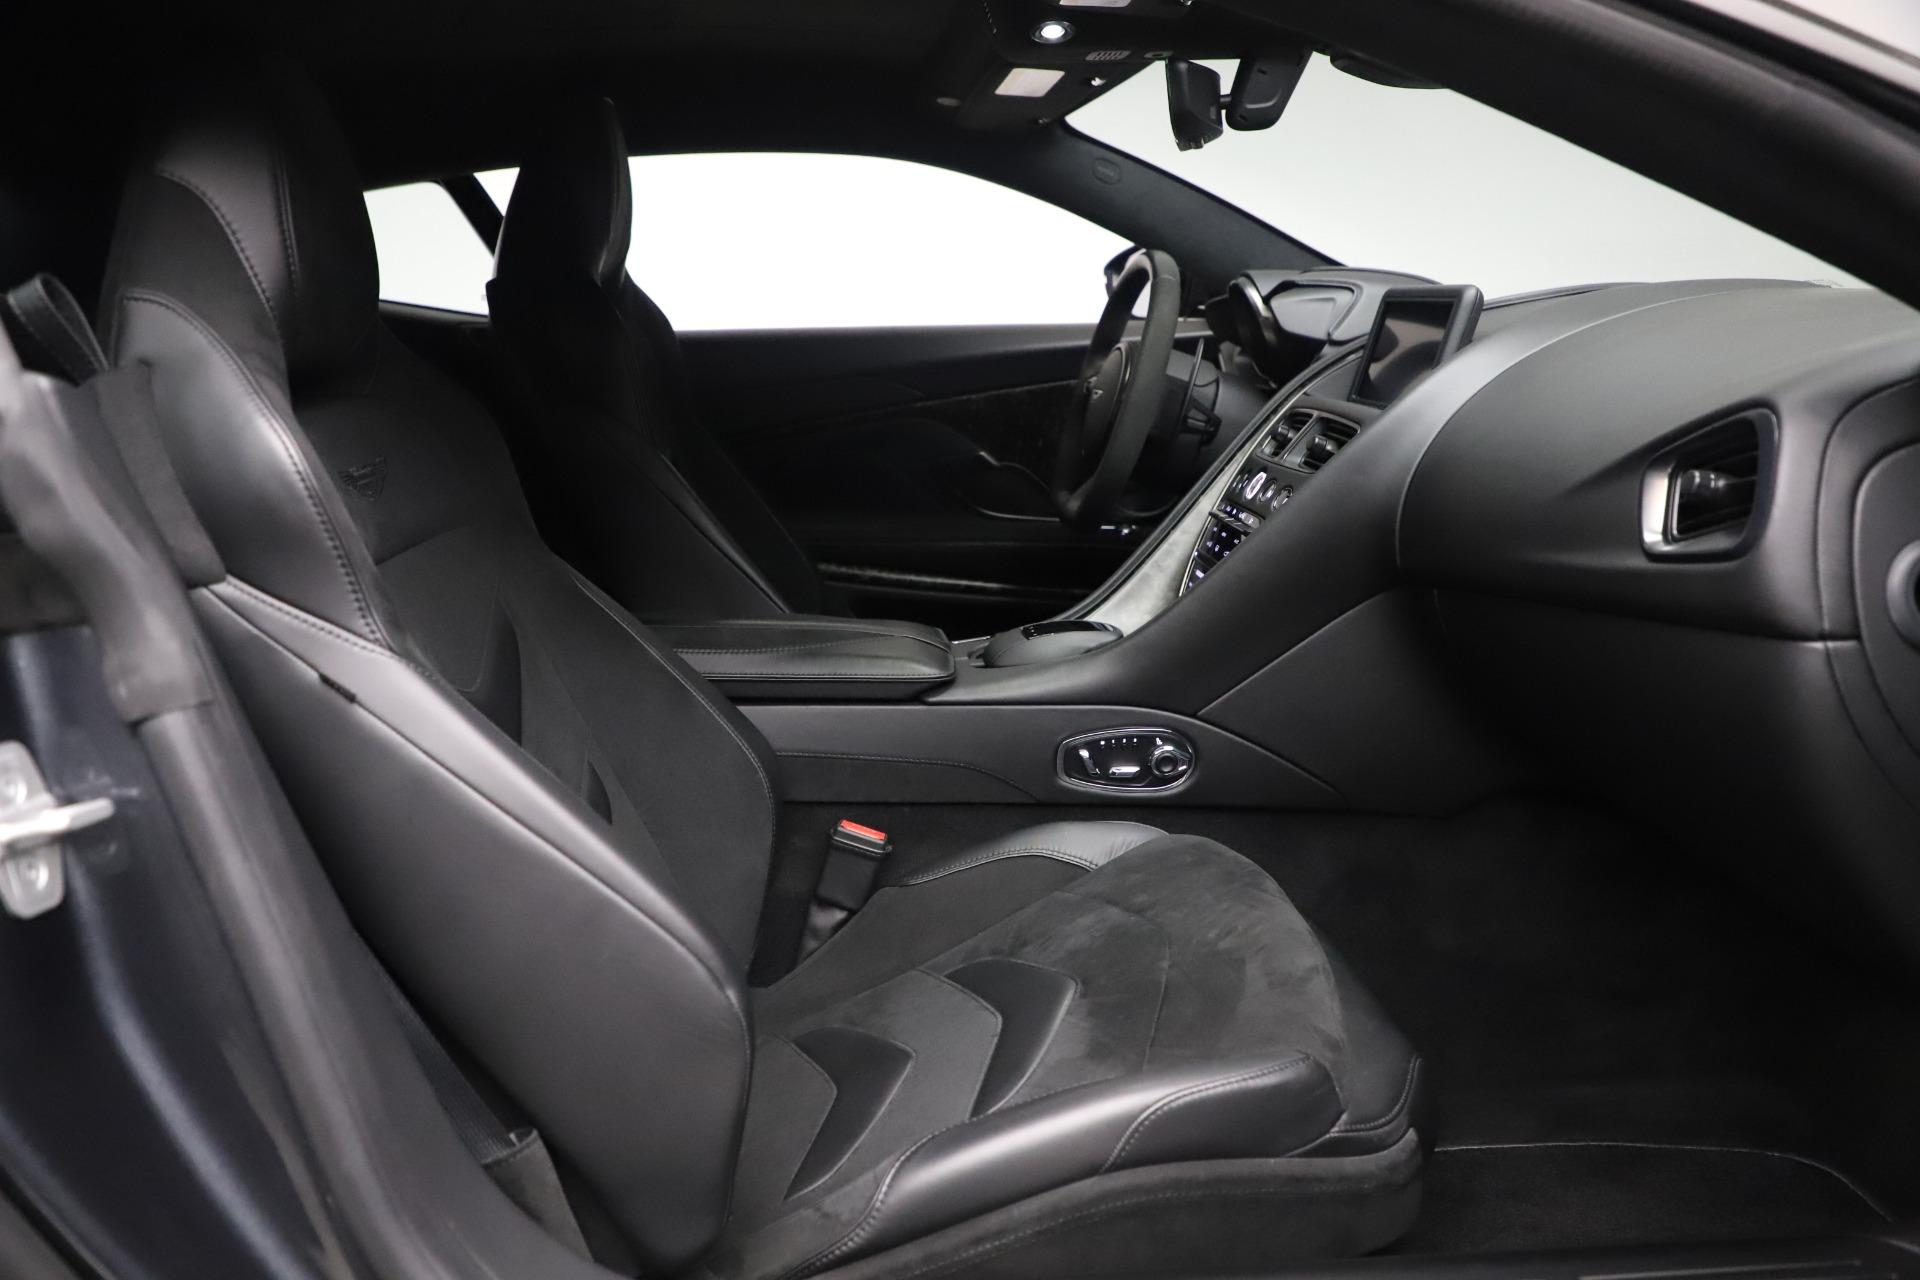 Used 2019 Aston Martin DBS Superleggera Coupe For Sale In Greenwich, CT. Alfa Romeo of Greenwich, A1438B 3570_p23